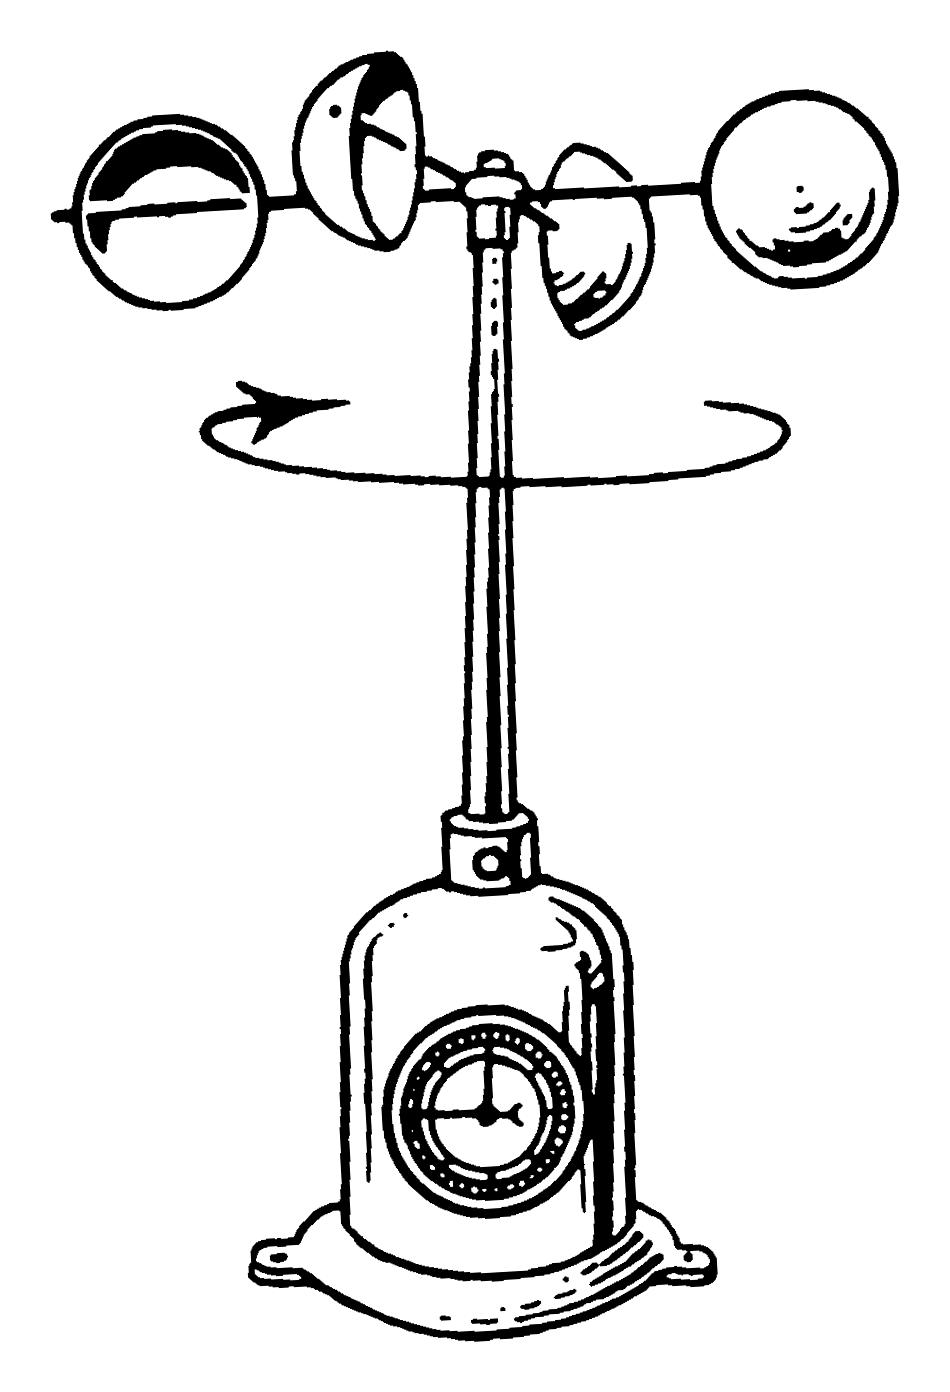 file anemometer 002 png